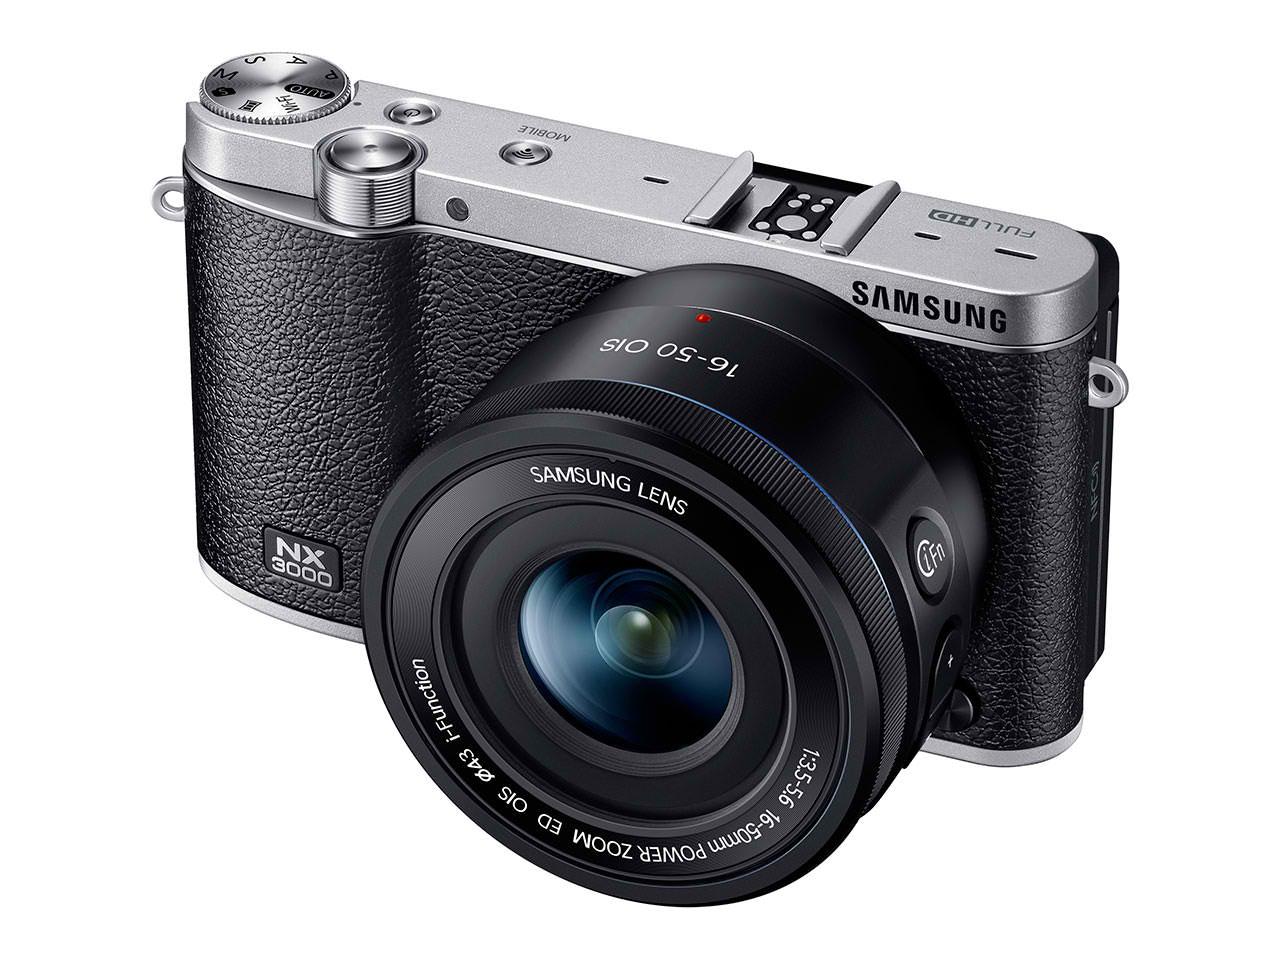 Appareil photo hybride Samsung NX3000 + objectif 16-50mm + Lightroom 5 + flash